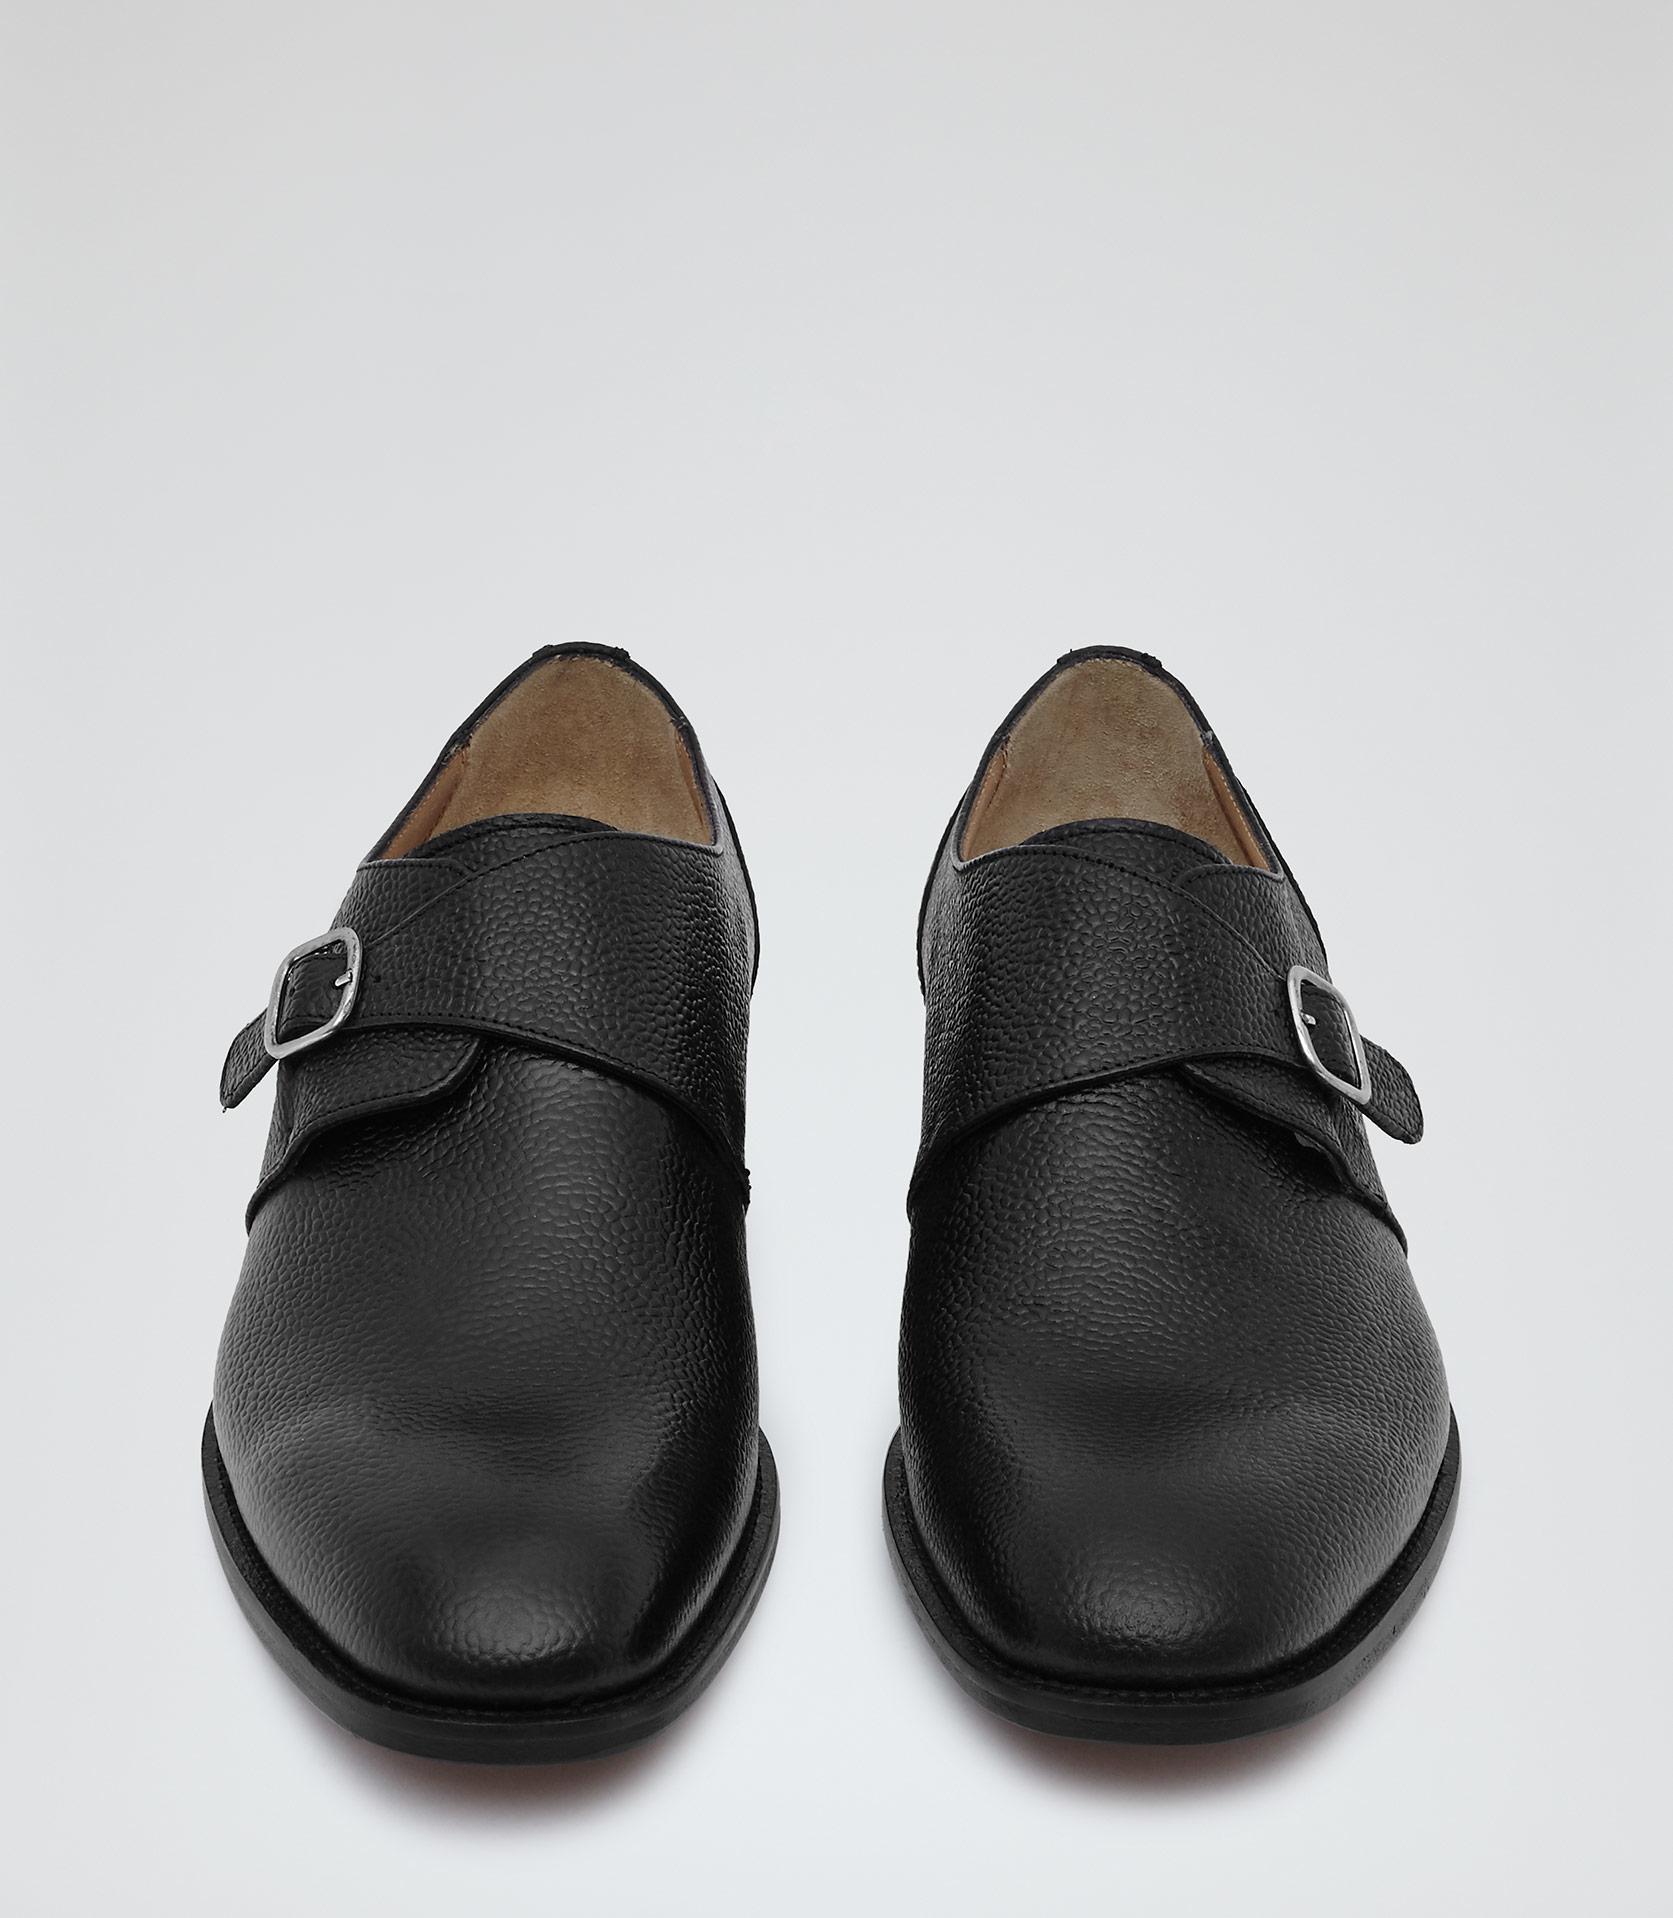 Reiss Paul Monk Strap Shoes In Black For Men Lyst